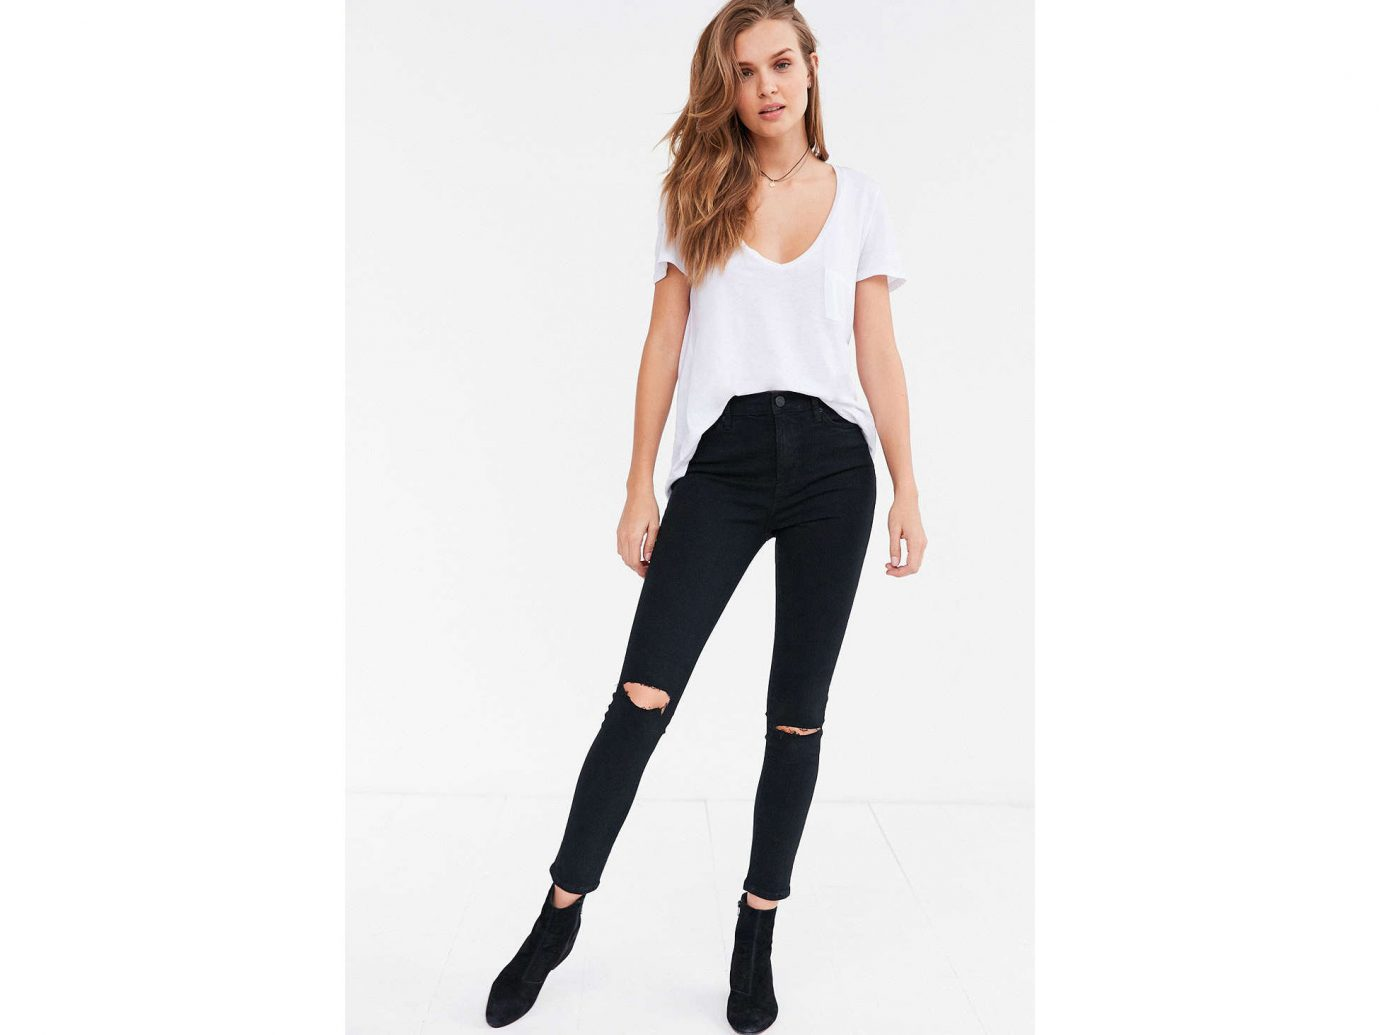 Style + Design clothing jeans person waist shoulder leggings fashion model joint tights trousers trouser neck abdomen trunk human leg denim thigh posing